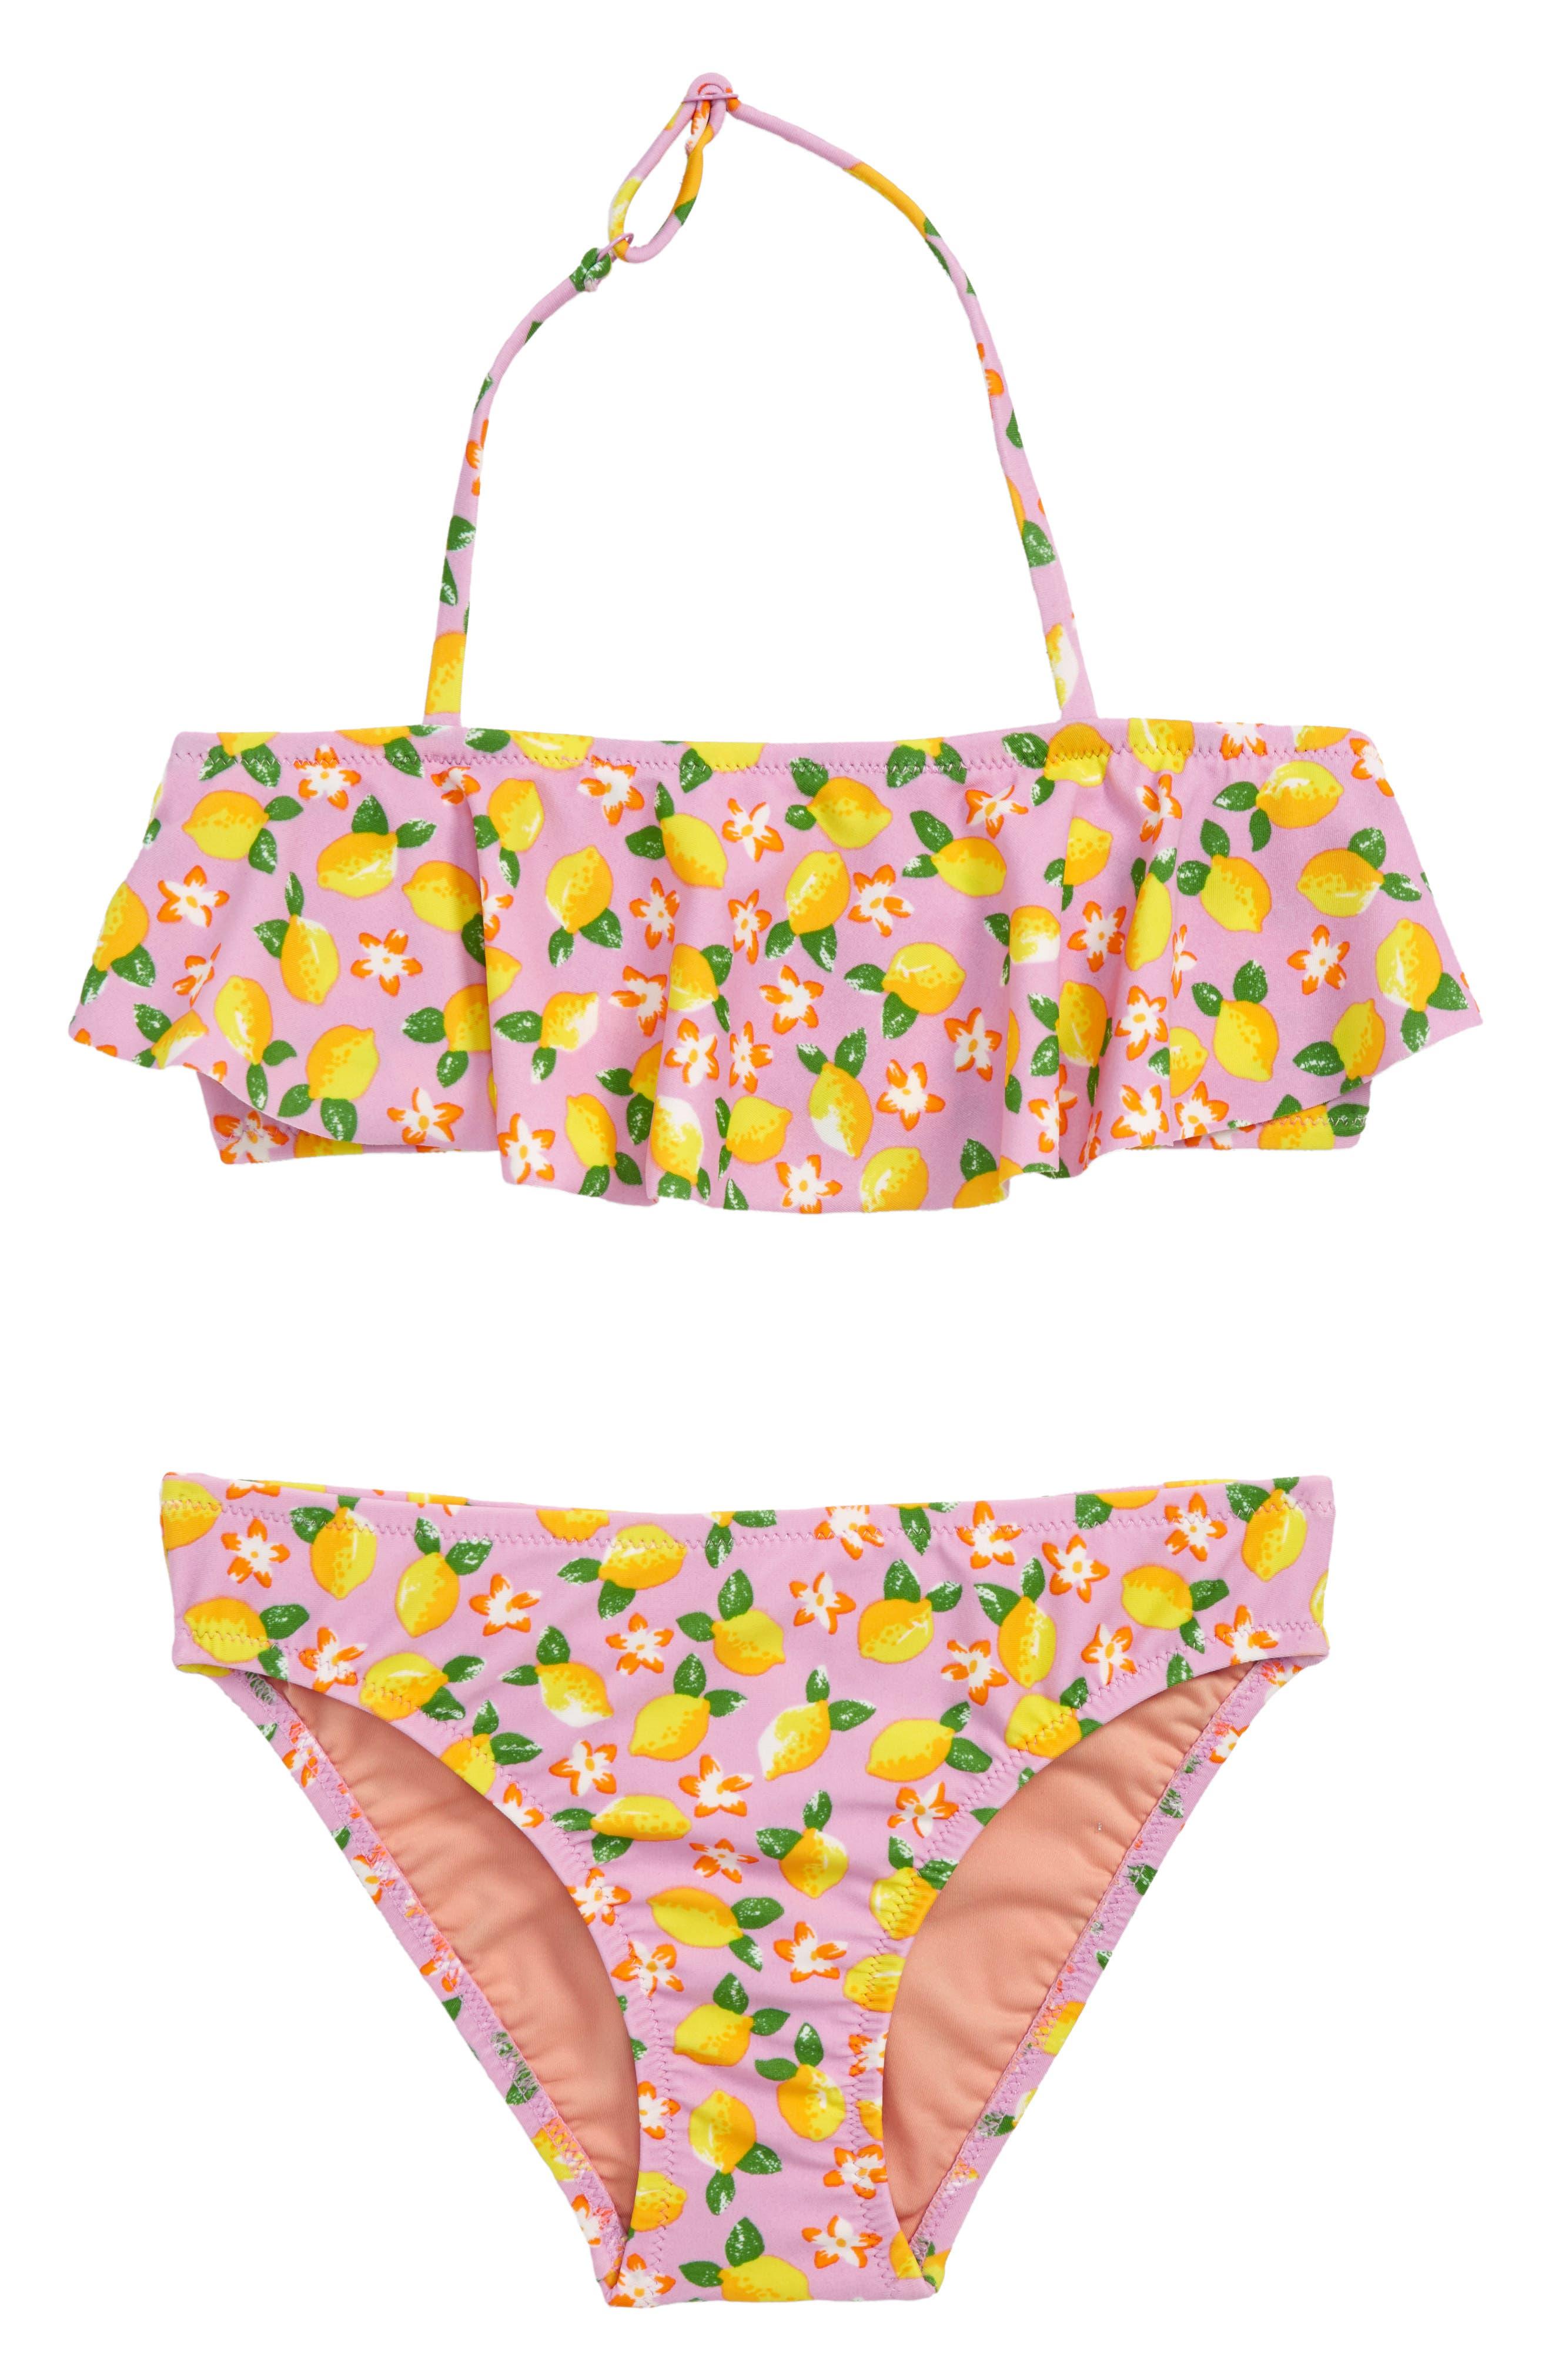 Lemon Print Ruffle Two-Piece Swimsuit,                             Main thumbnail 1, color,                             650